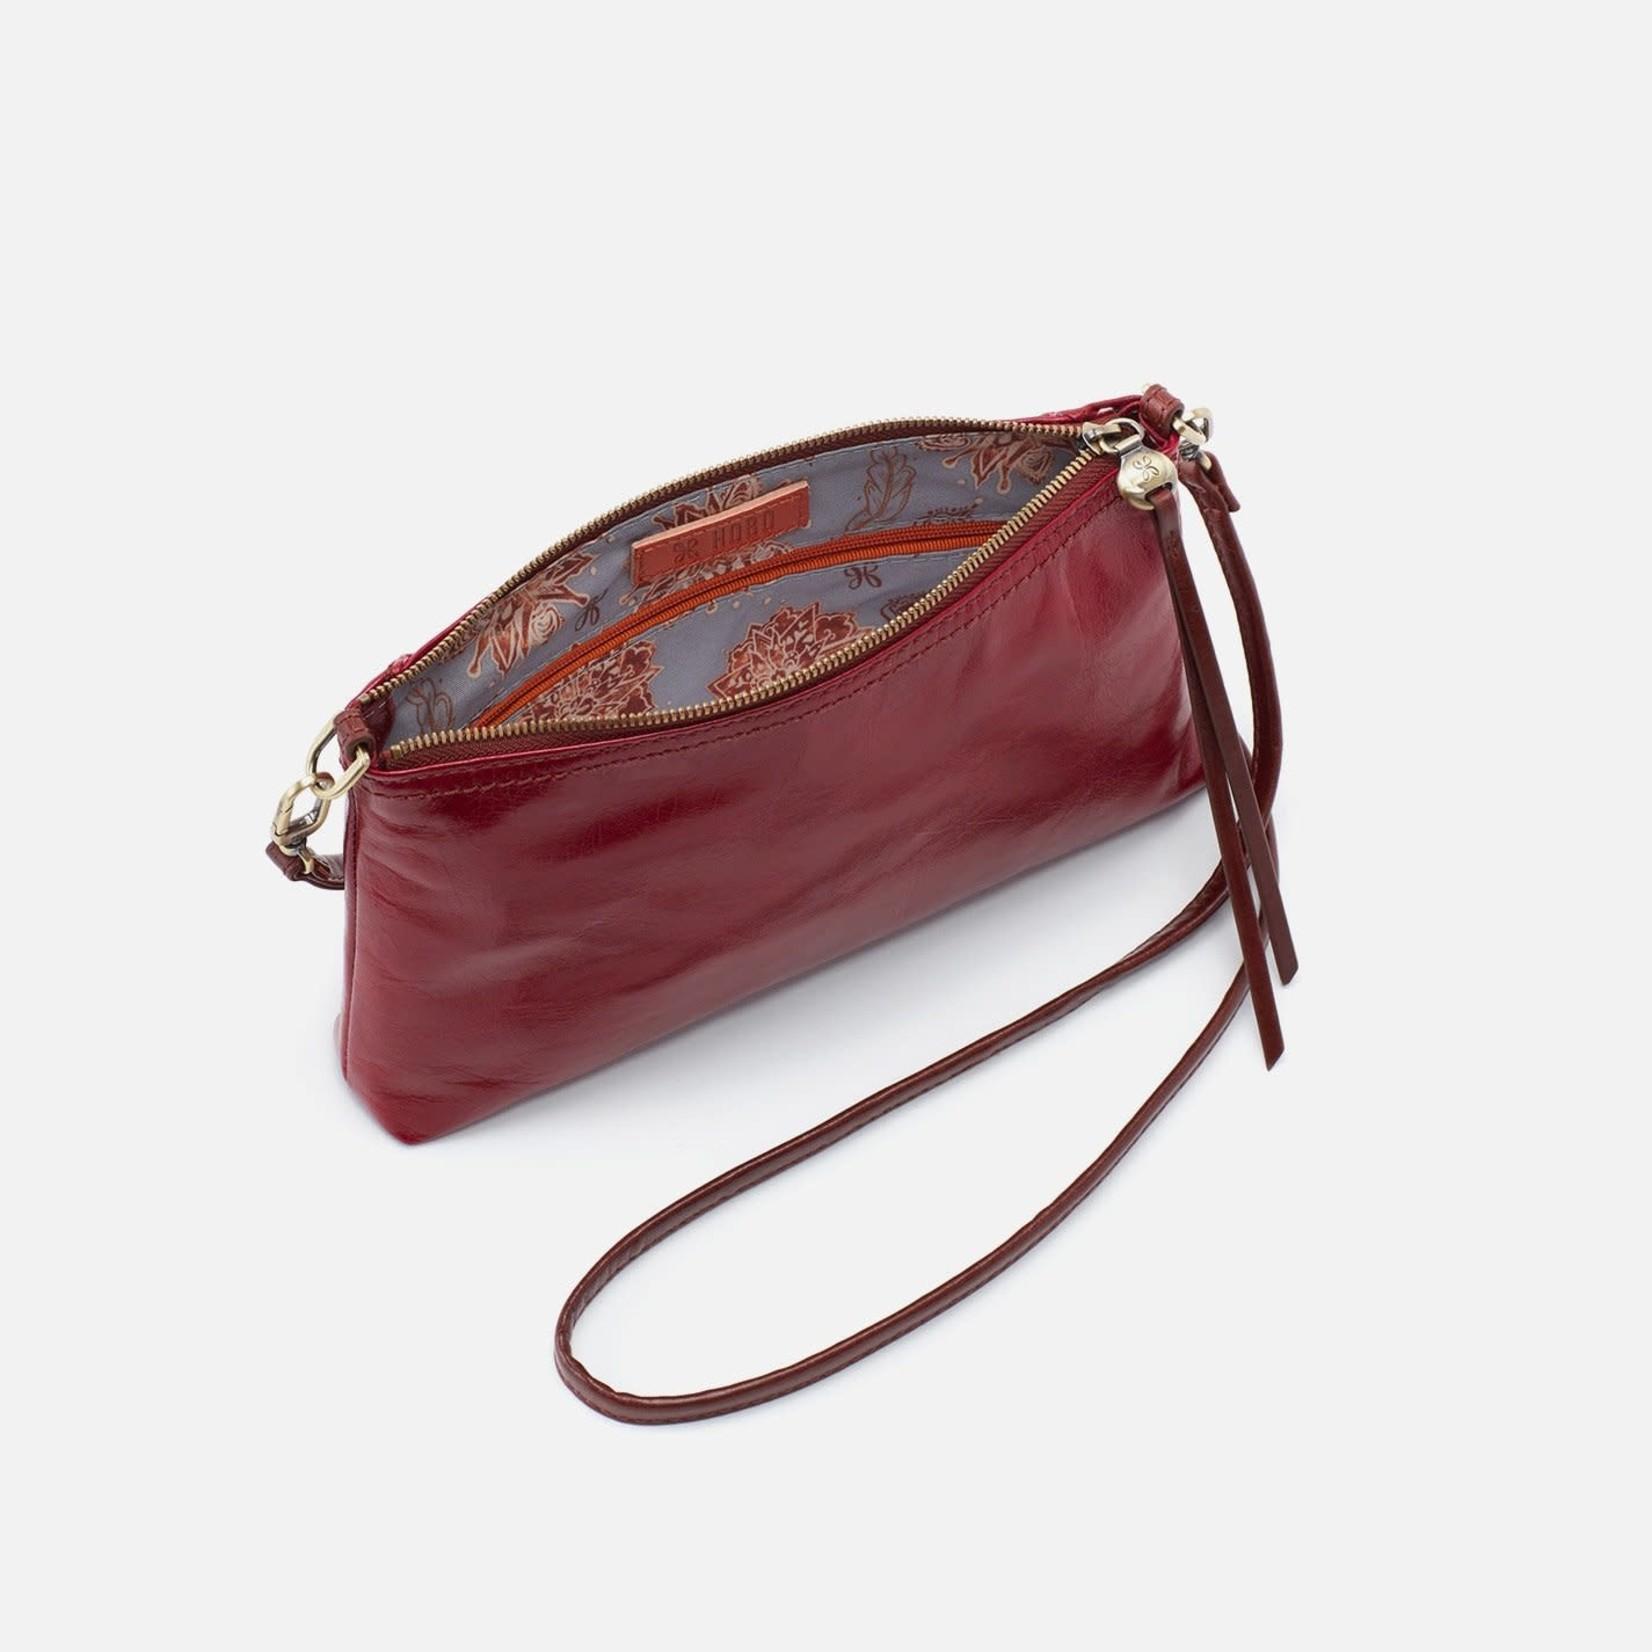 HOBO Darcy Cardinal Vintage Hide Leather Wristlet/Crossbody